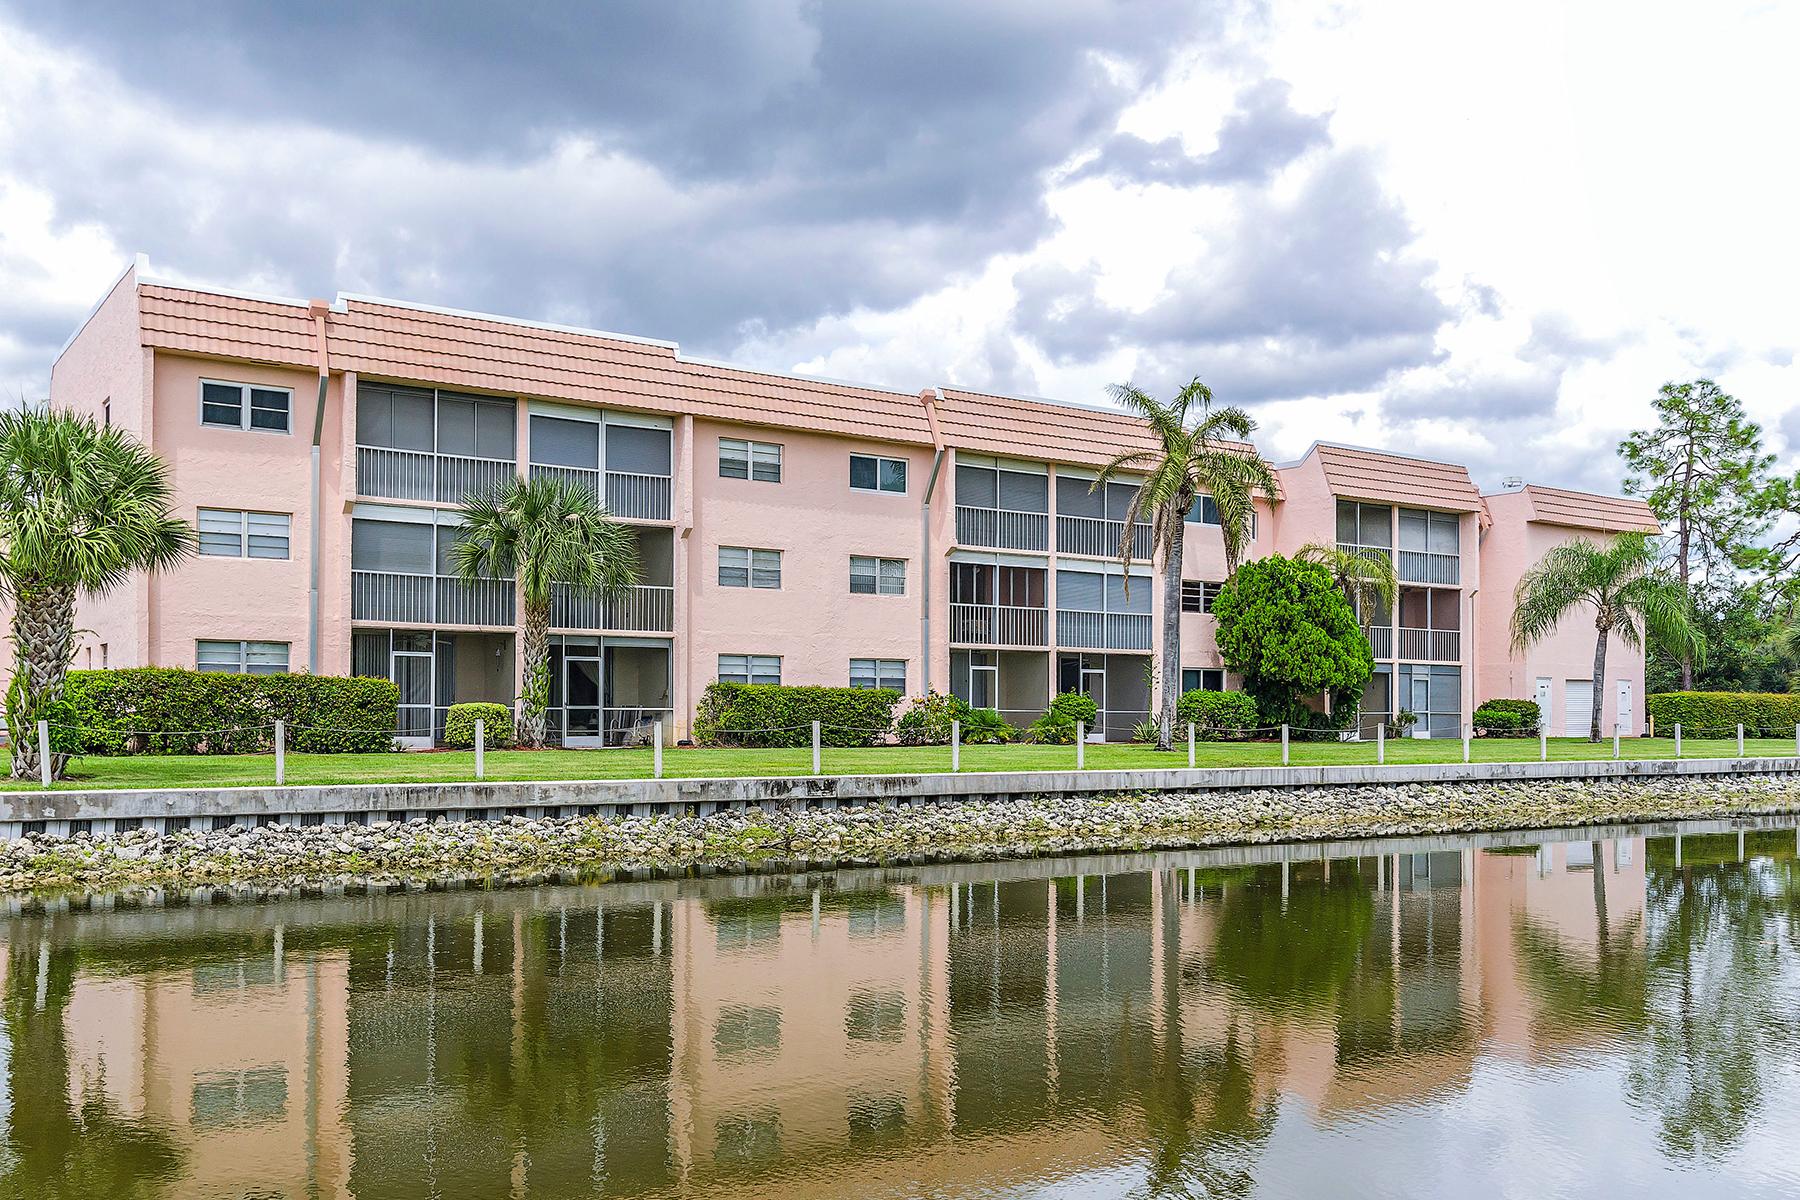 Кооперативная квартира для того Продажа на 190 Turtle Lake Ct , 6-210, Naples, FL 34105 190 Turtle Lake Ct 6-210 Naples, Флорида 34105 Соединенные Штаты